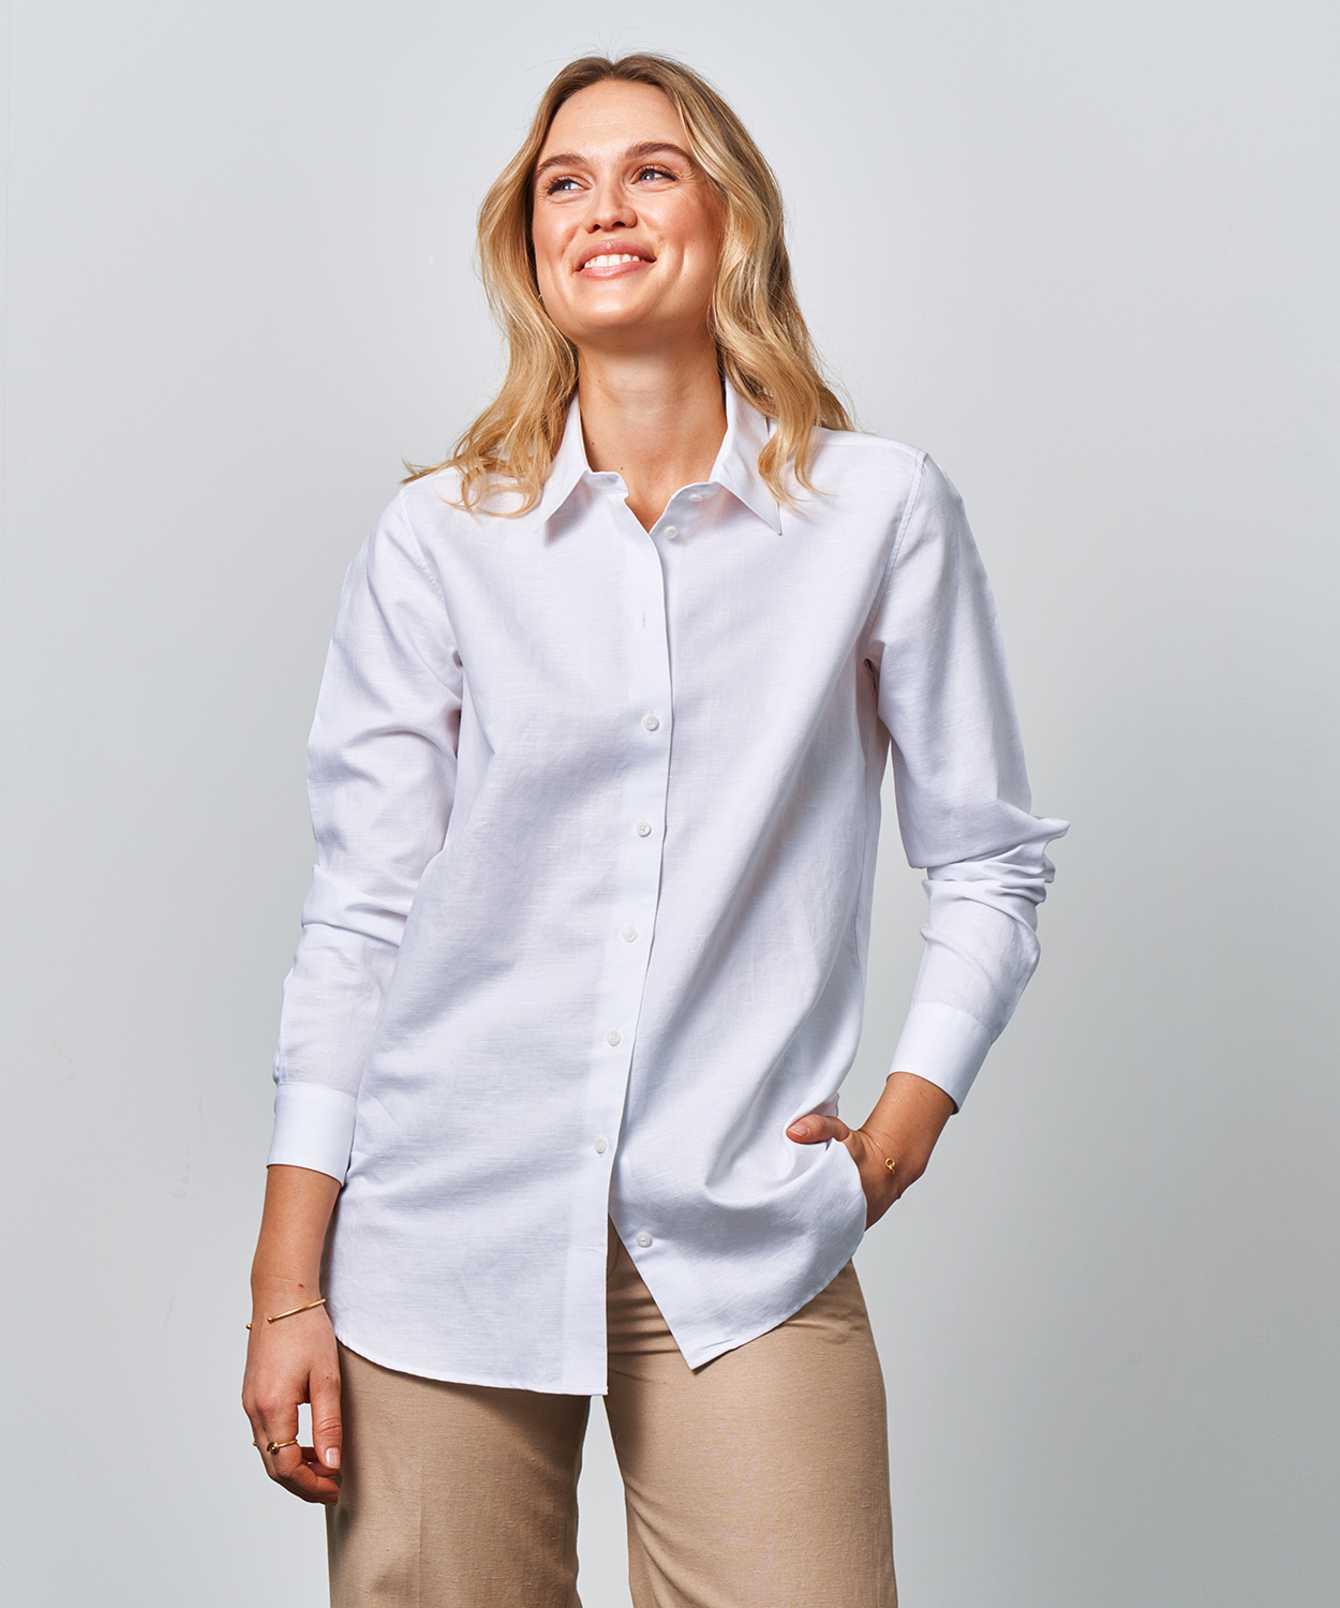 Skjorta Mickan Portofino Vit  The Shirt Factory